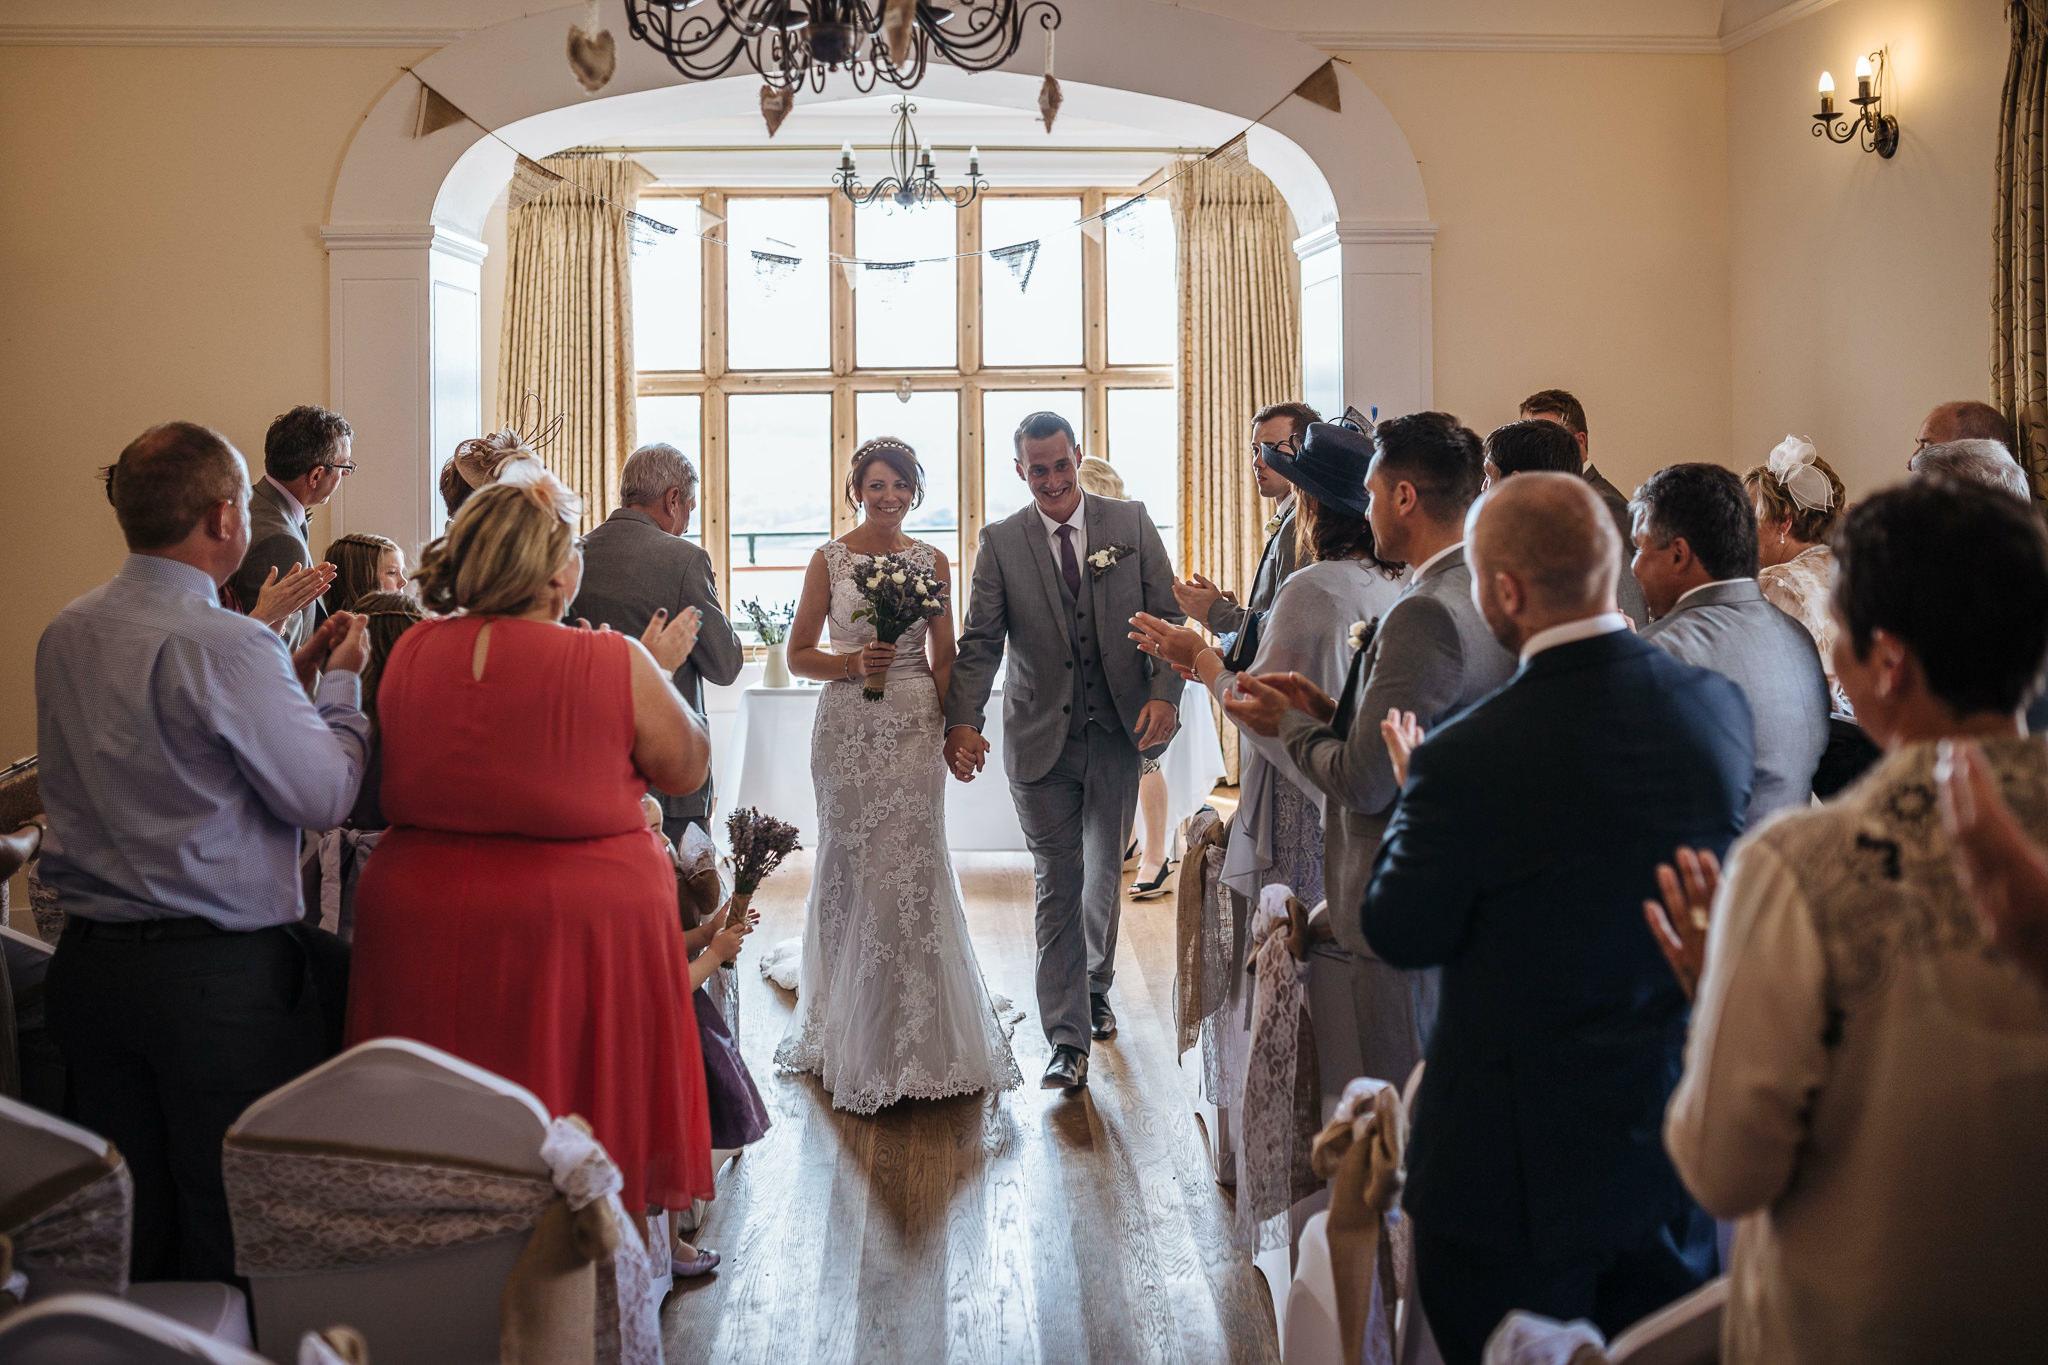 paul-marbrook-Caer-Llan-Wedding-Photographer-90049